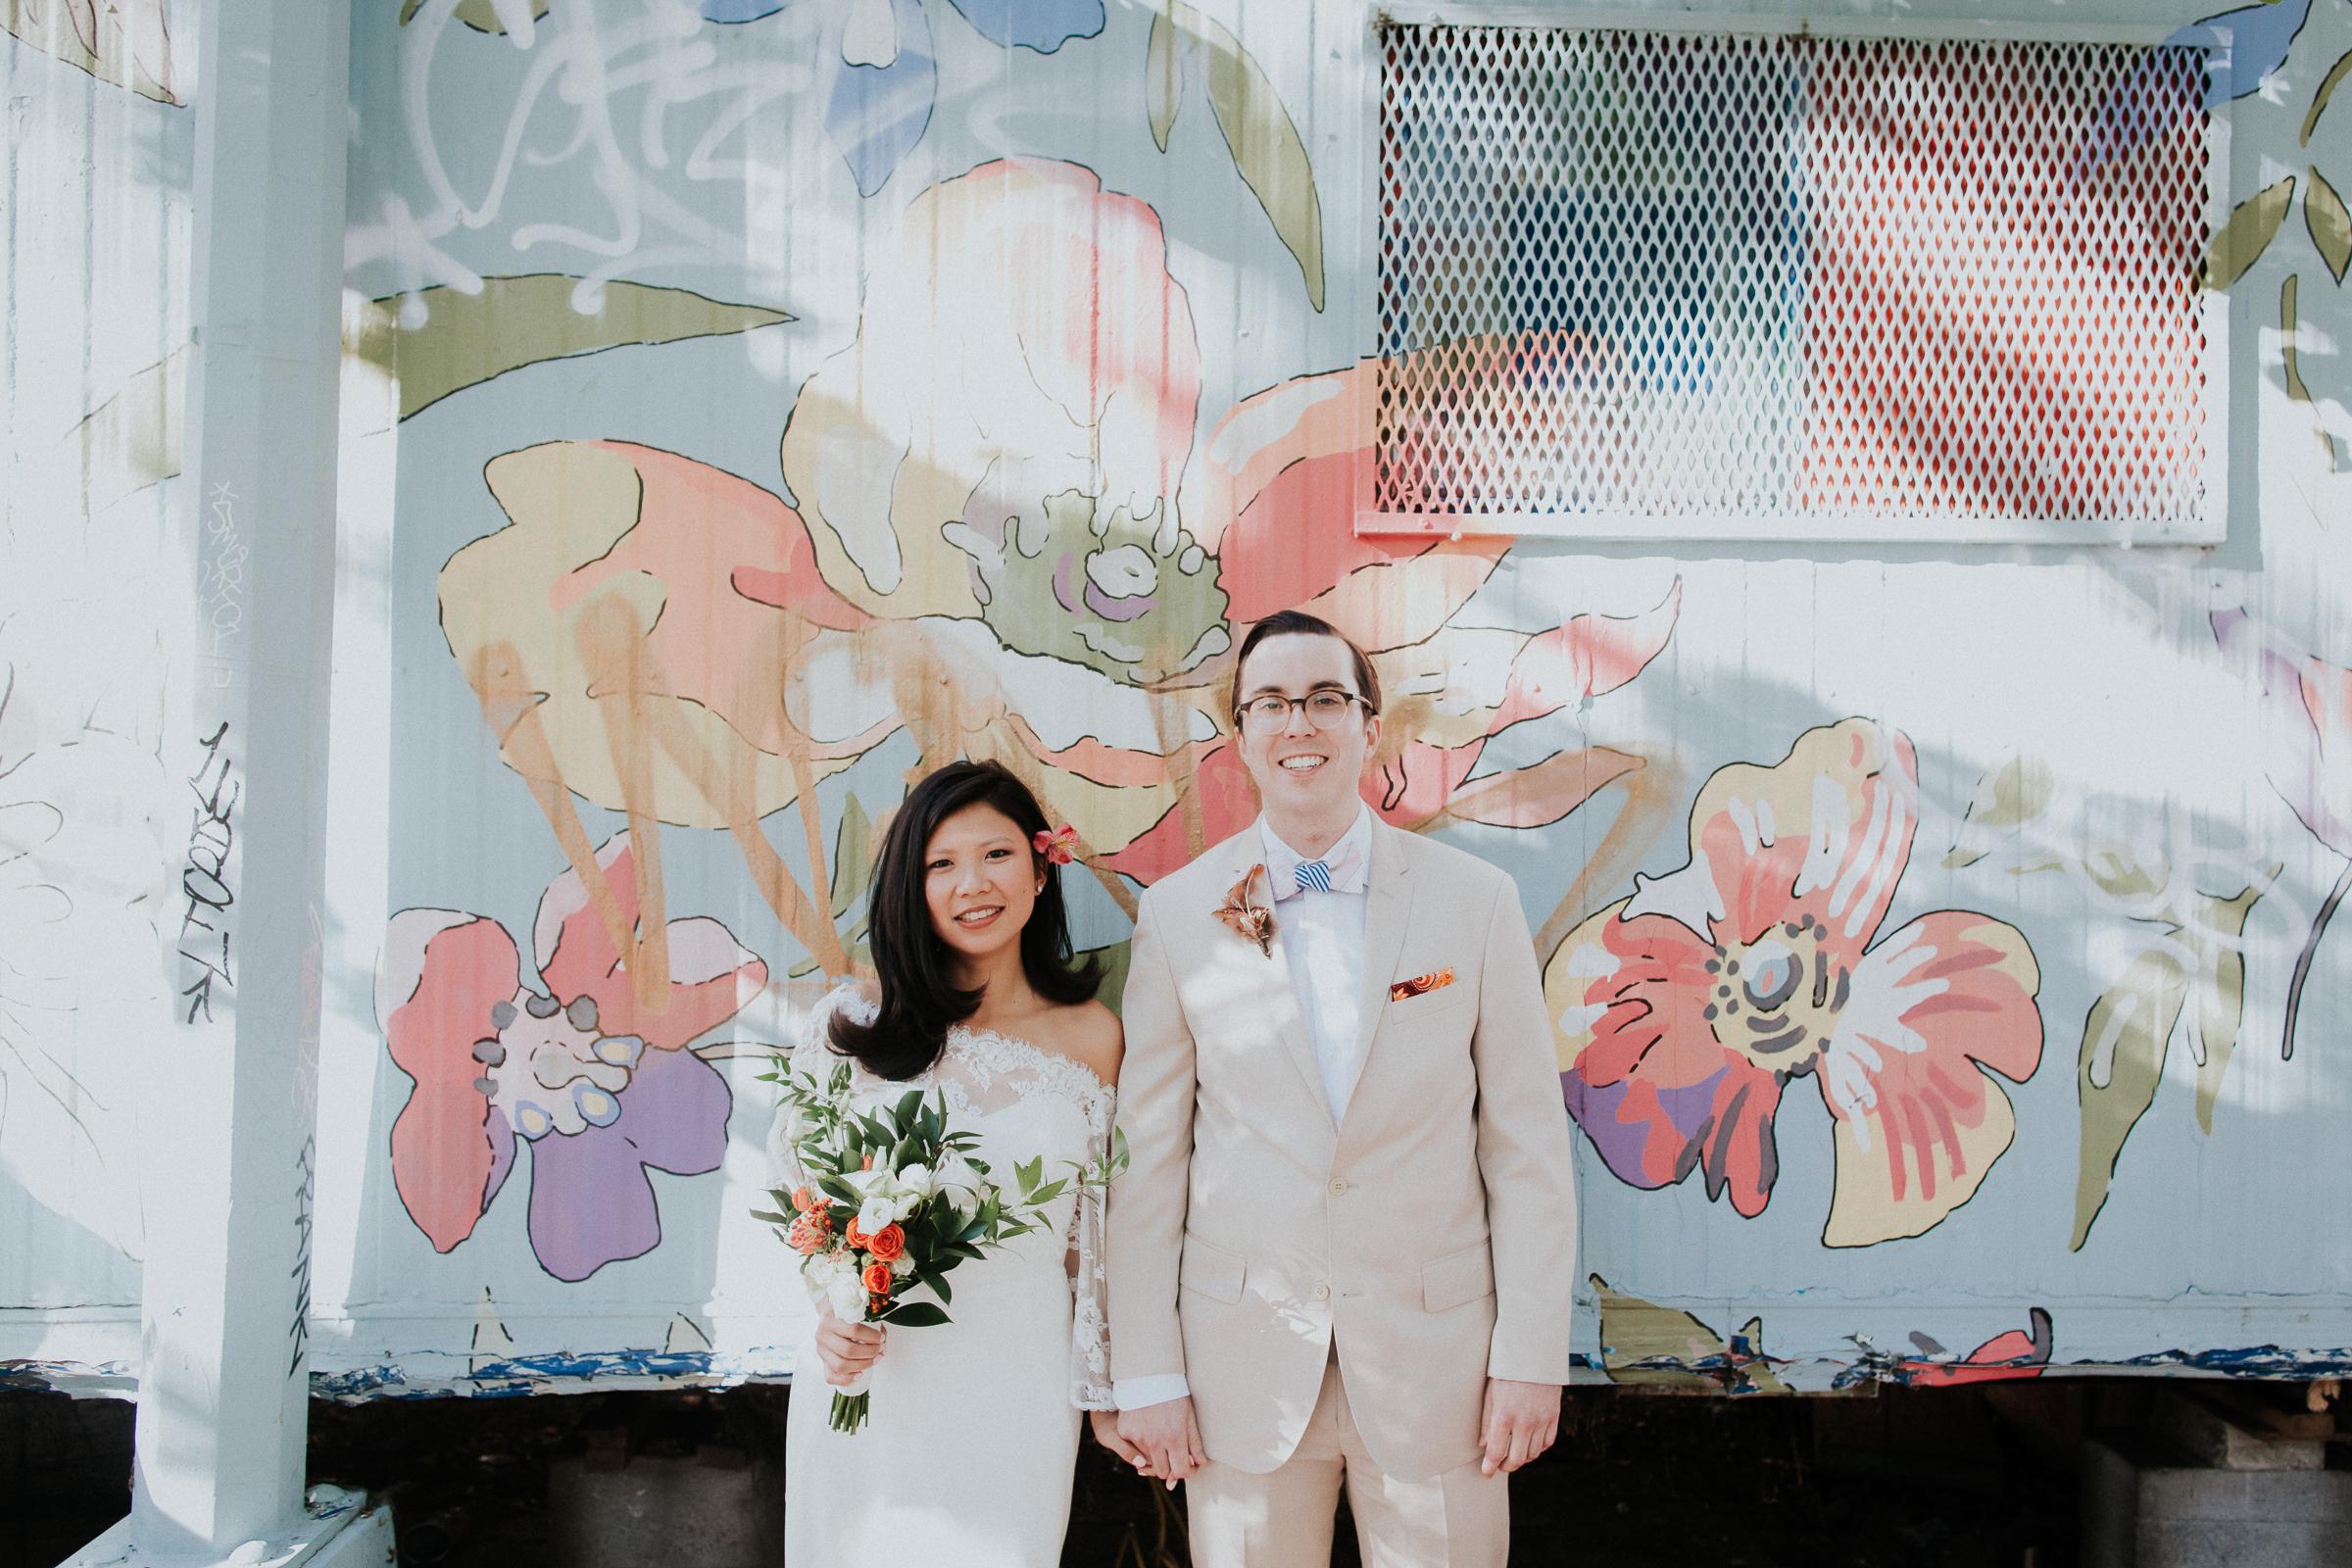 The-Bhakti-Center-Yoga-NYC-Rooftop-Documentary-Wedding-Photographer-1.jpg